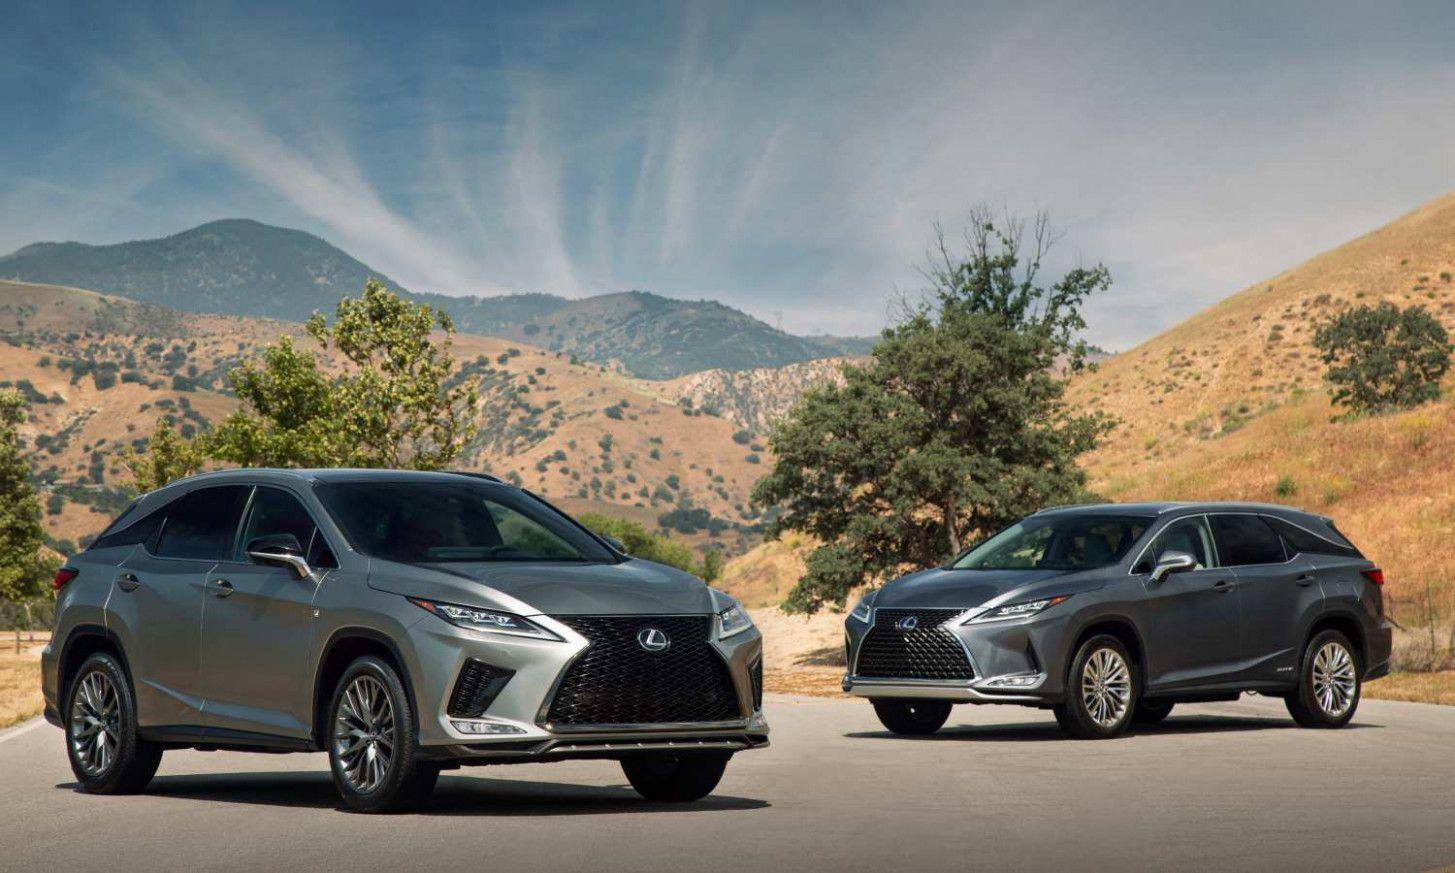 Lexus Gx Hybrid 2020 First Drive Di 2020